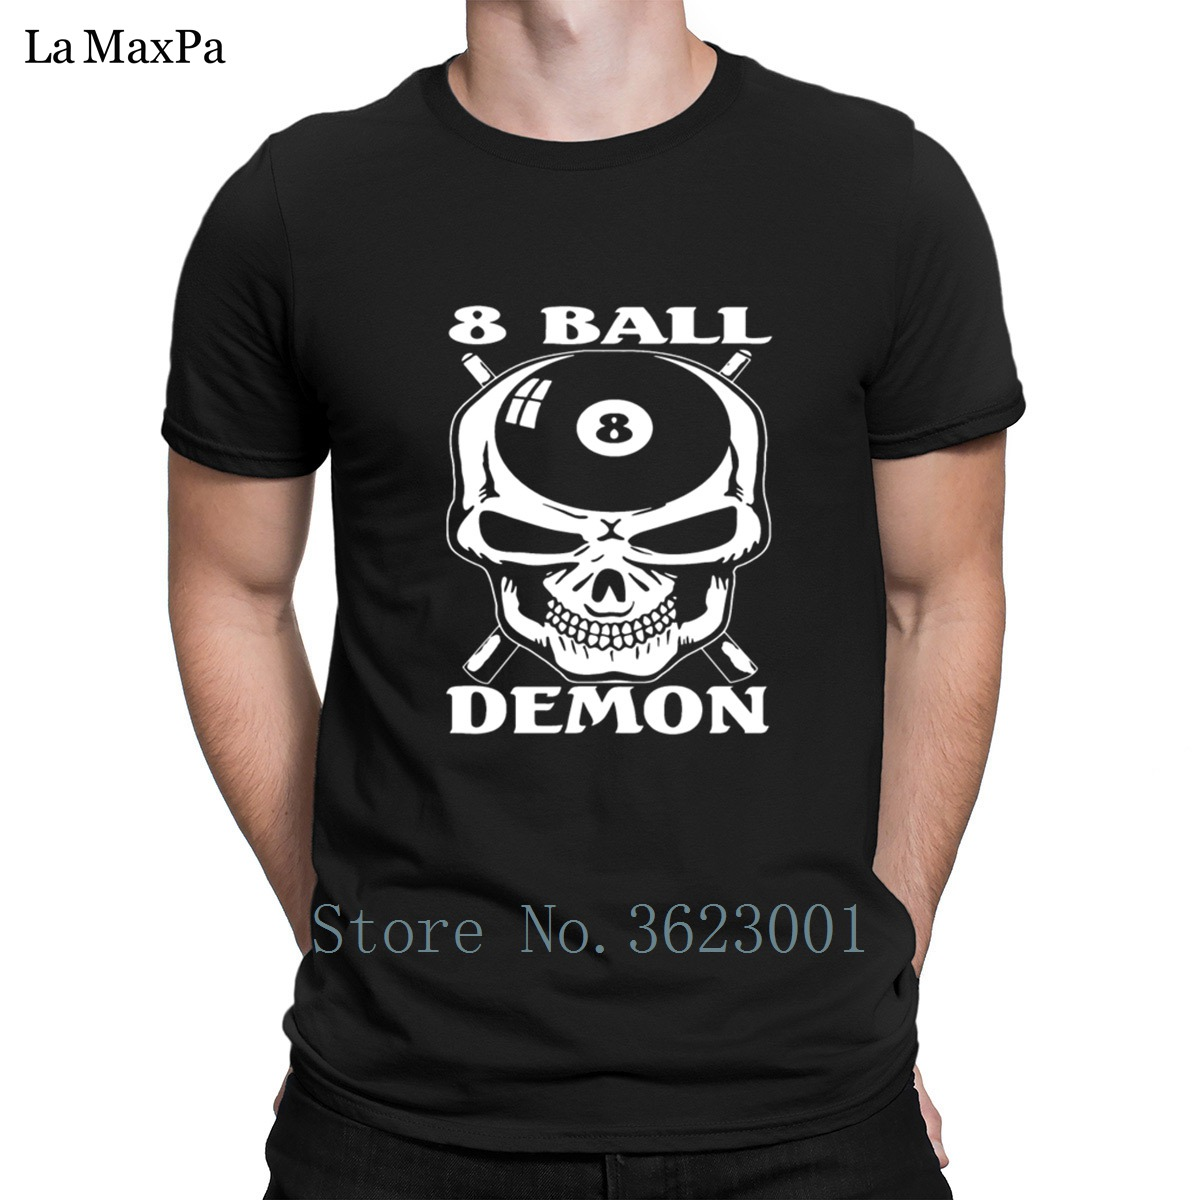 Printing Leisure T-Shirt For Men Camiseta De Billar Bola 8 Demon Tshirt Mens 2018 Tee Shirt Unique Mens T Shirt Plus Size Cute